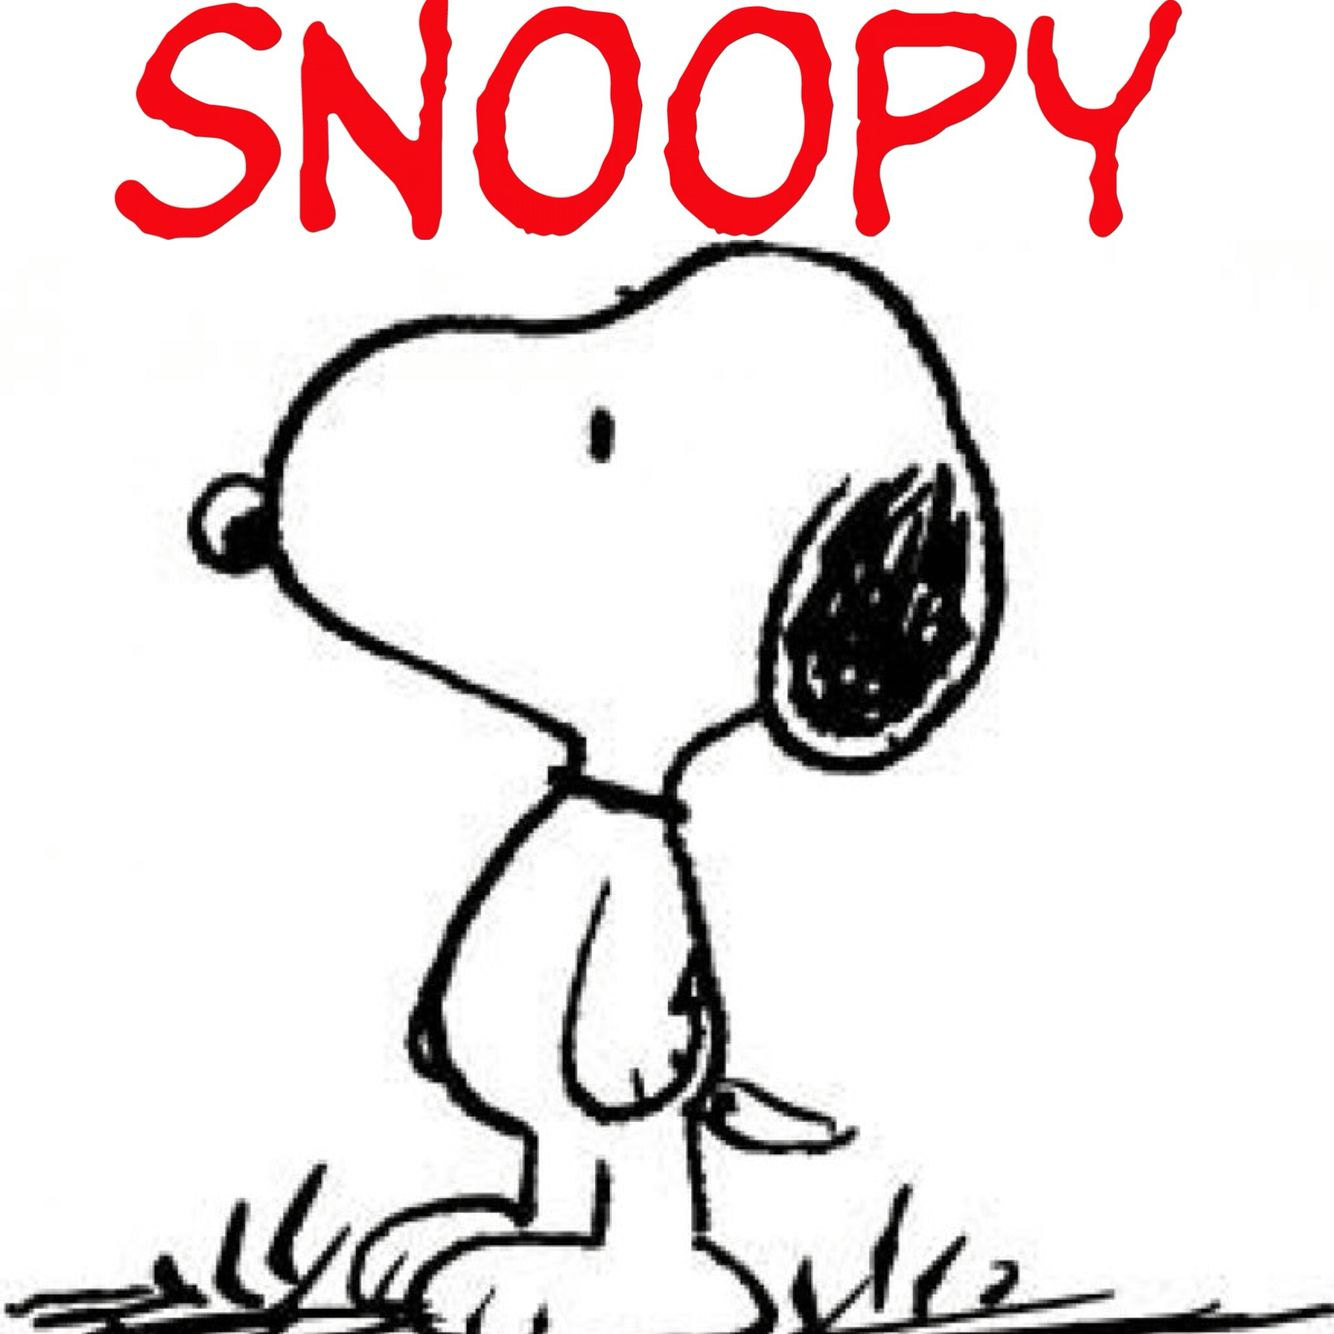 1950, Snoopy, Charles M. Schulz, Minneapolis, Minnesota, US #Snoopy ...